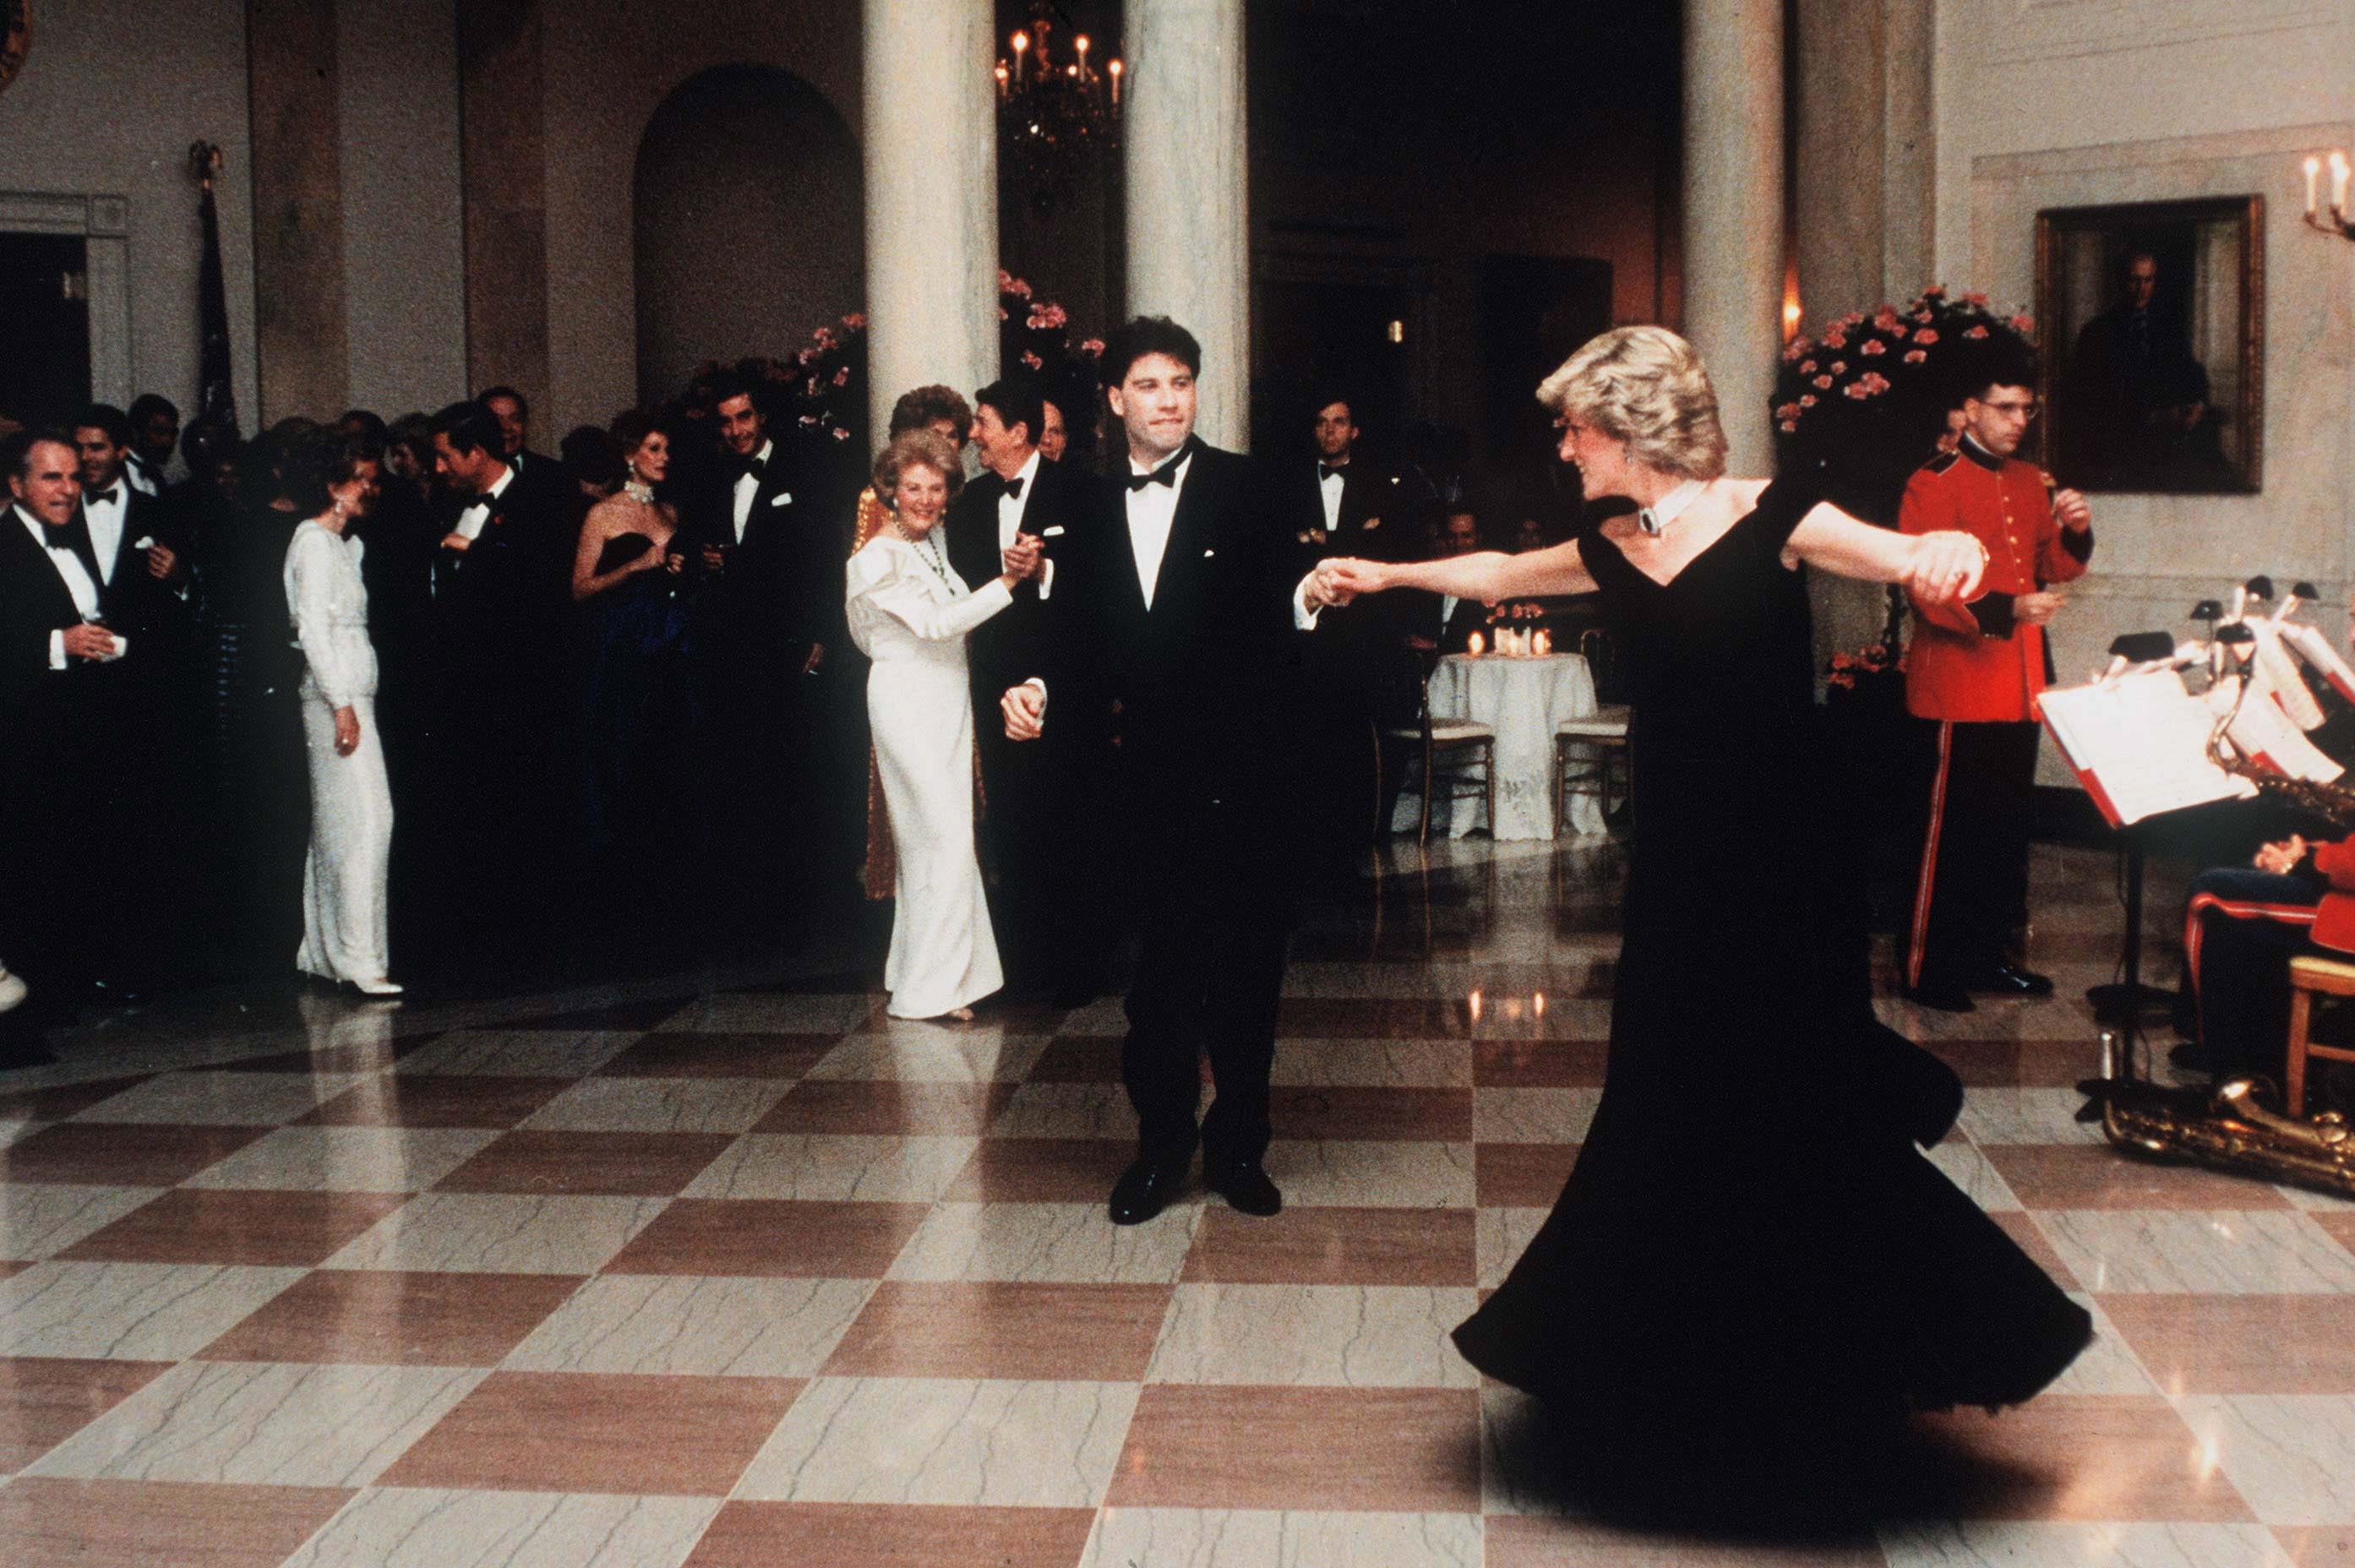 Princess Diana dances with John Travolta at The White House in Nov. 11, 1985.